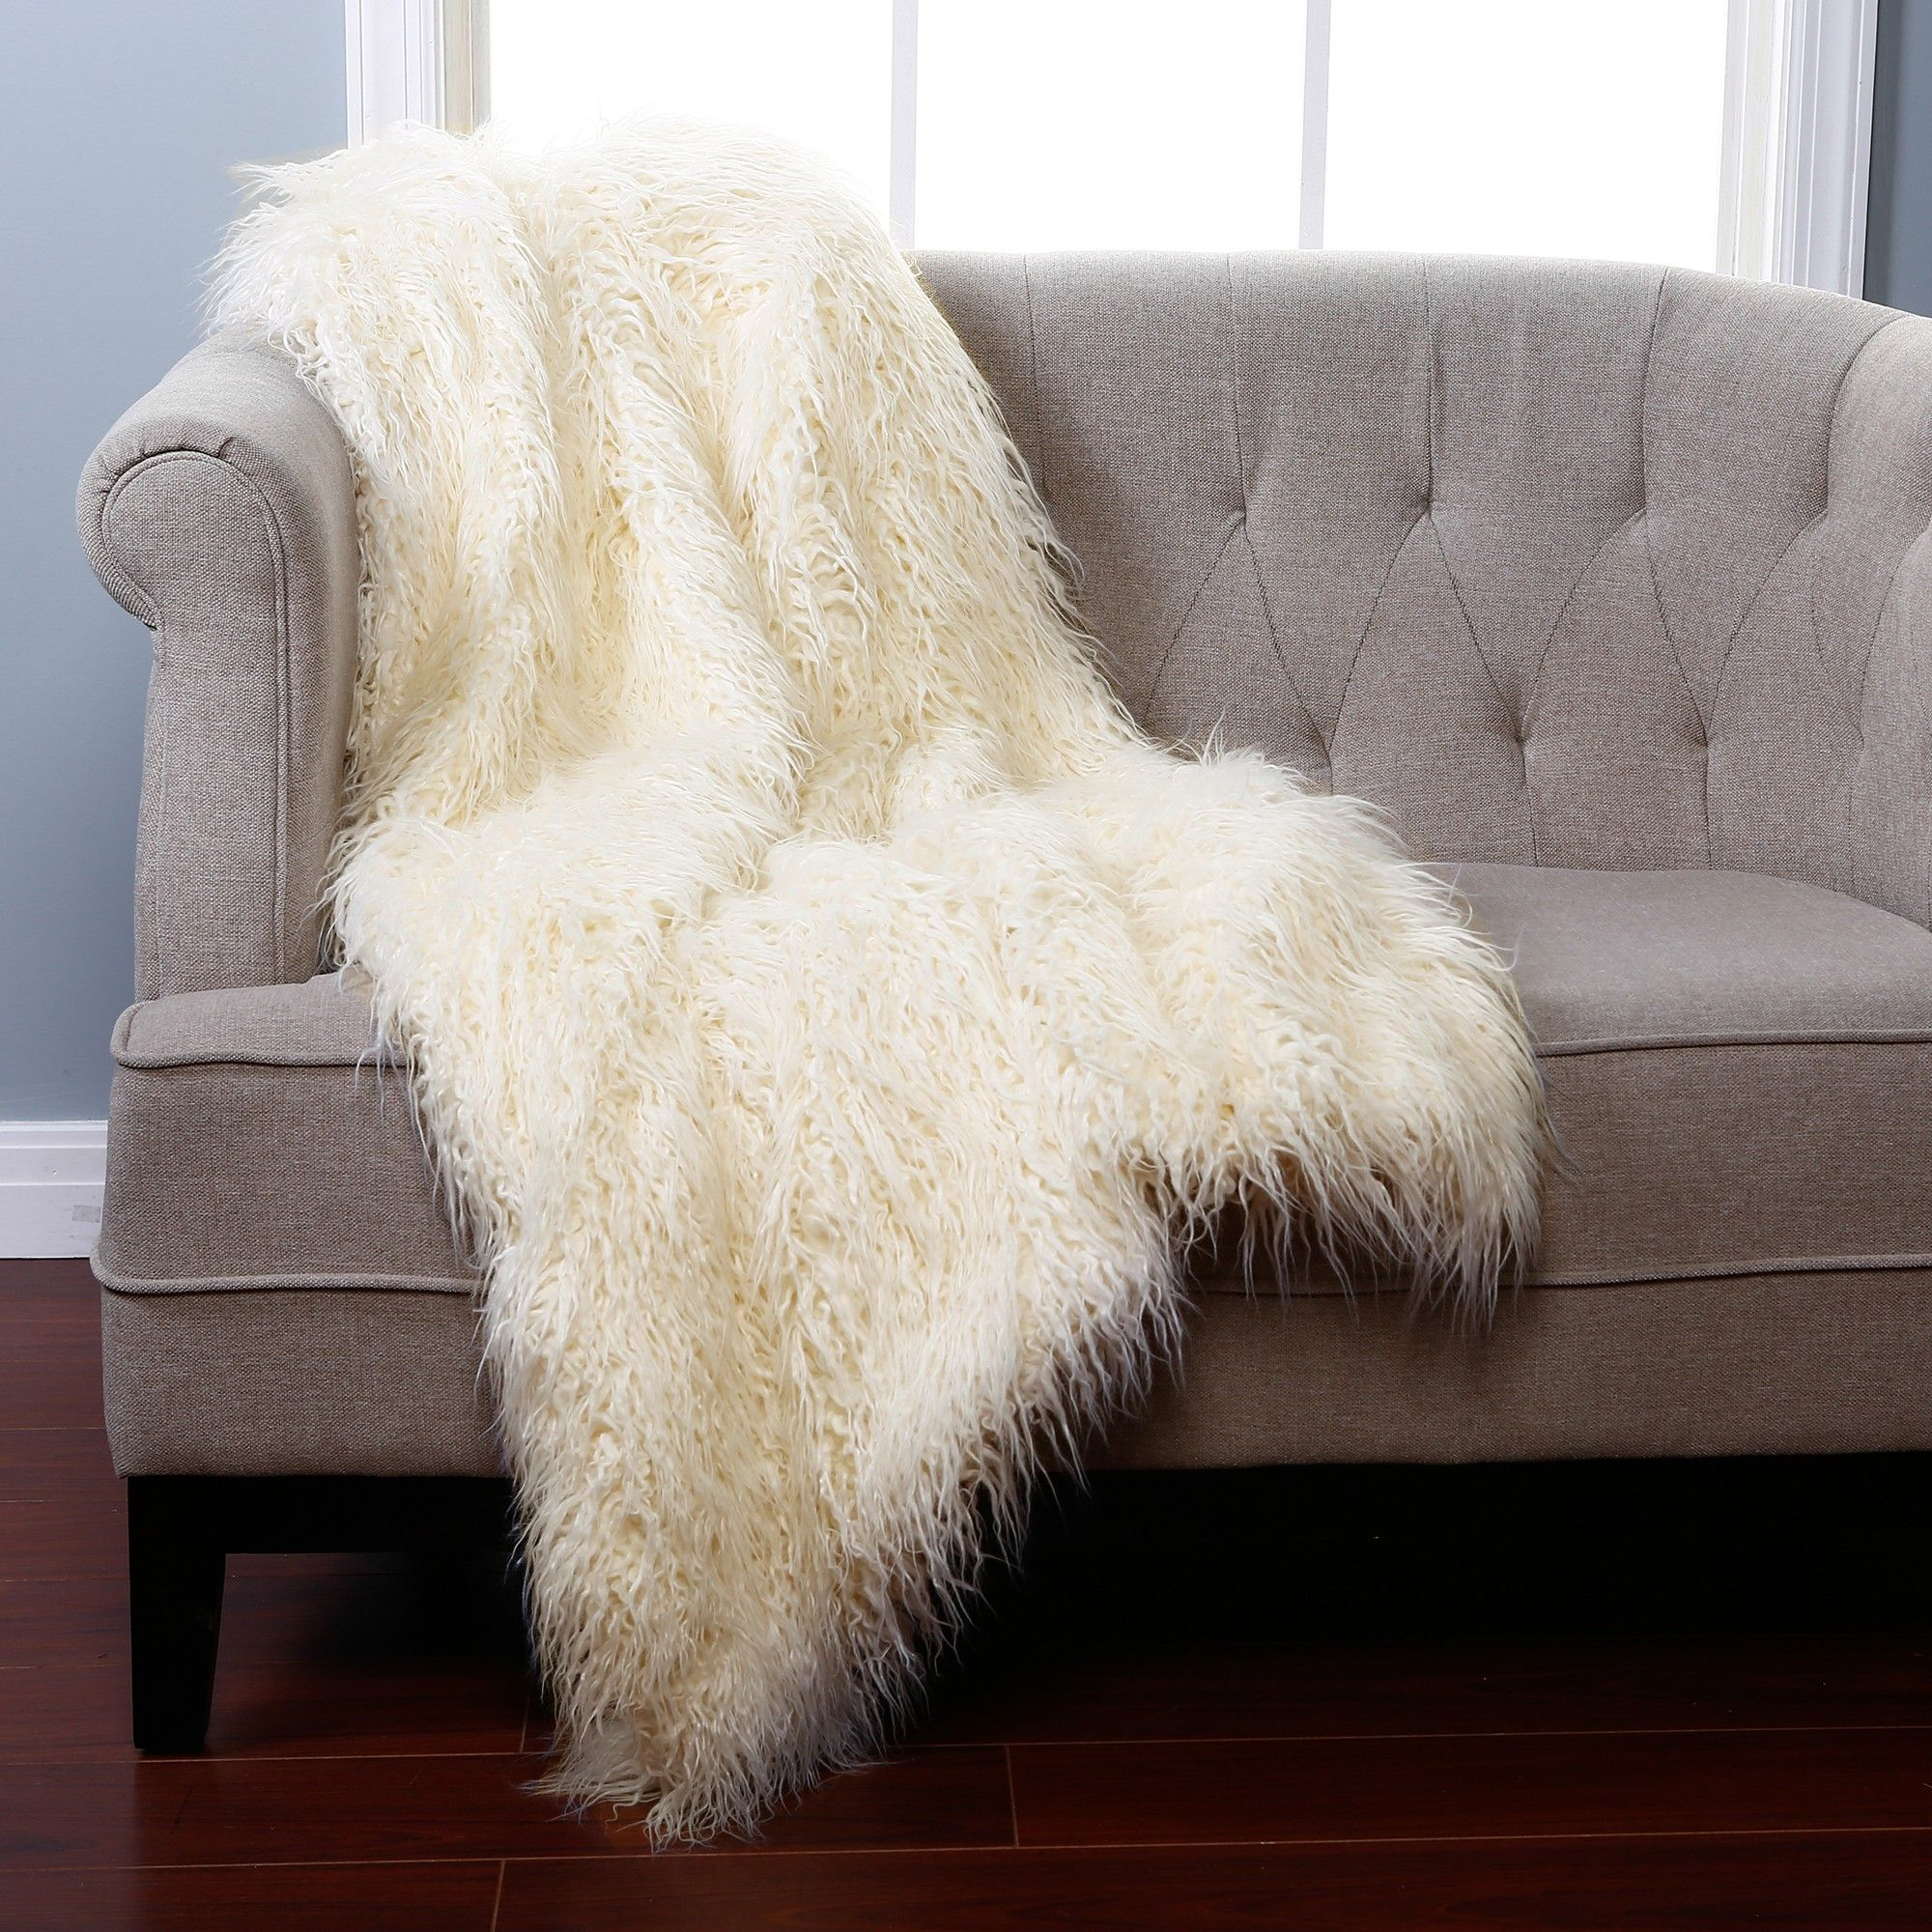 White Fluffy Sofa Cushions Best Affordable Sofas Sheepskin Throw Blanket Google Search Birthday 14